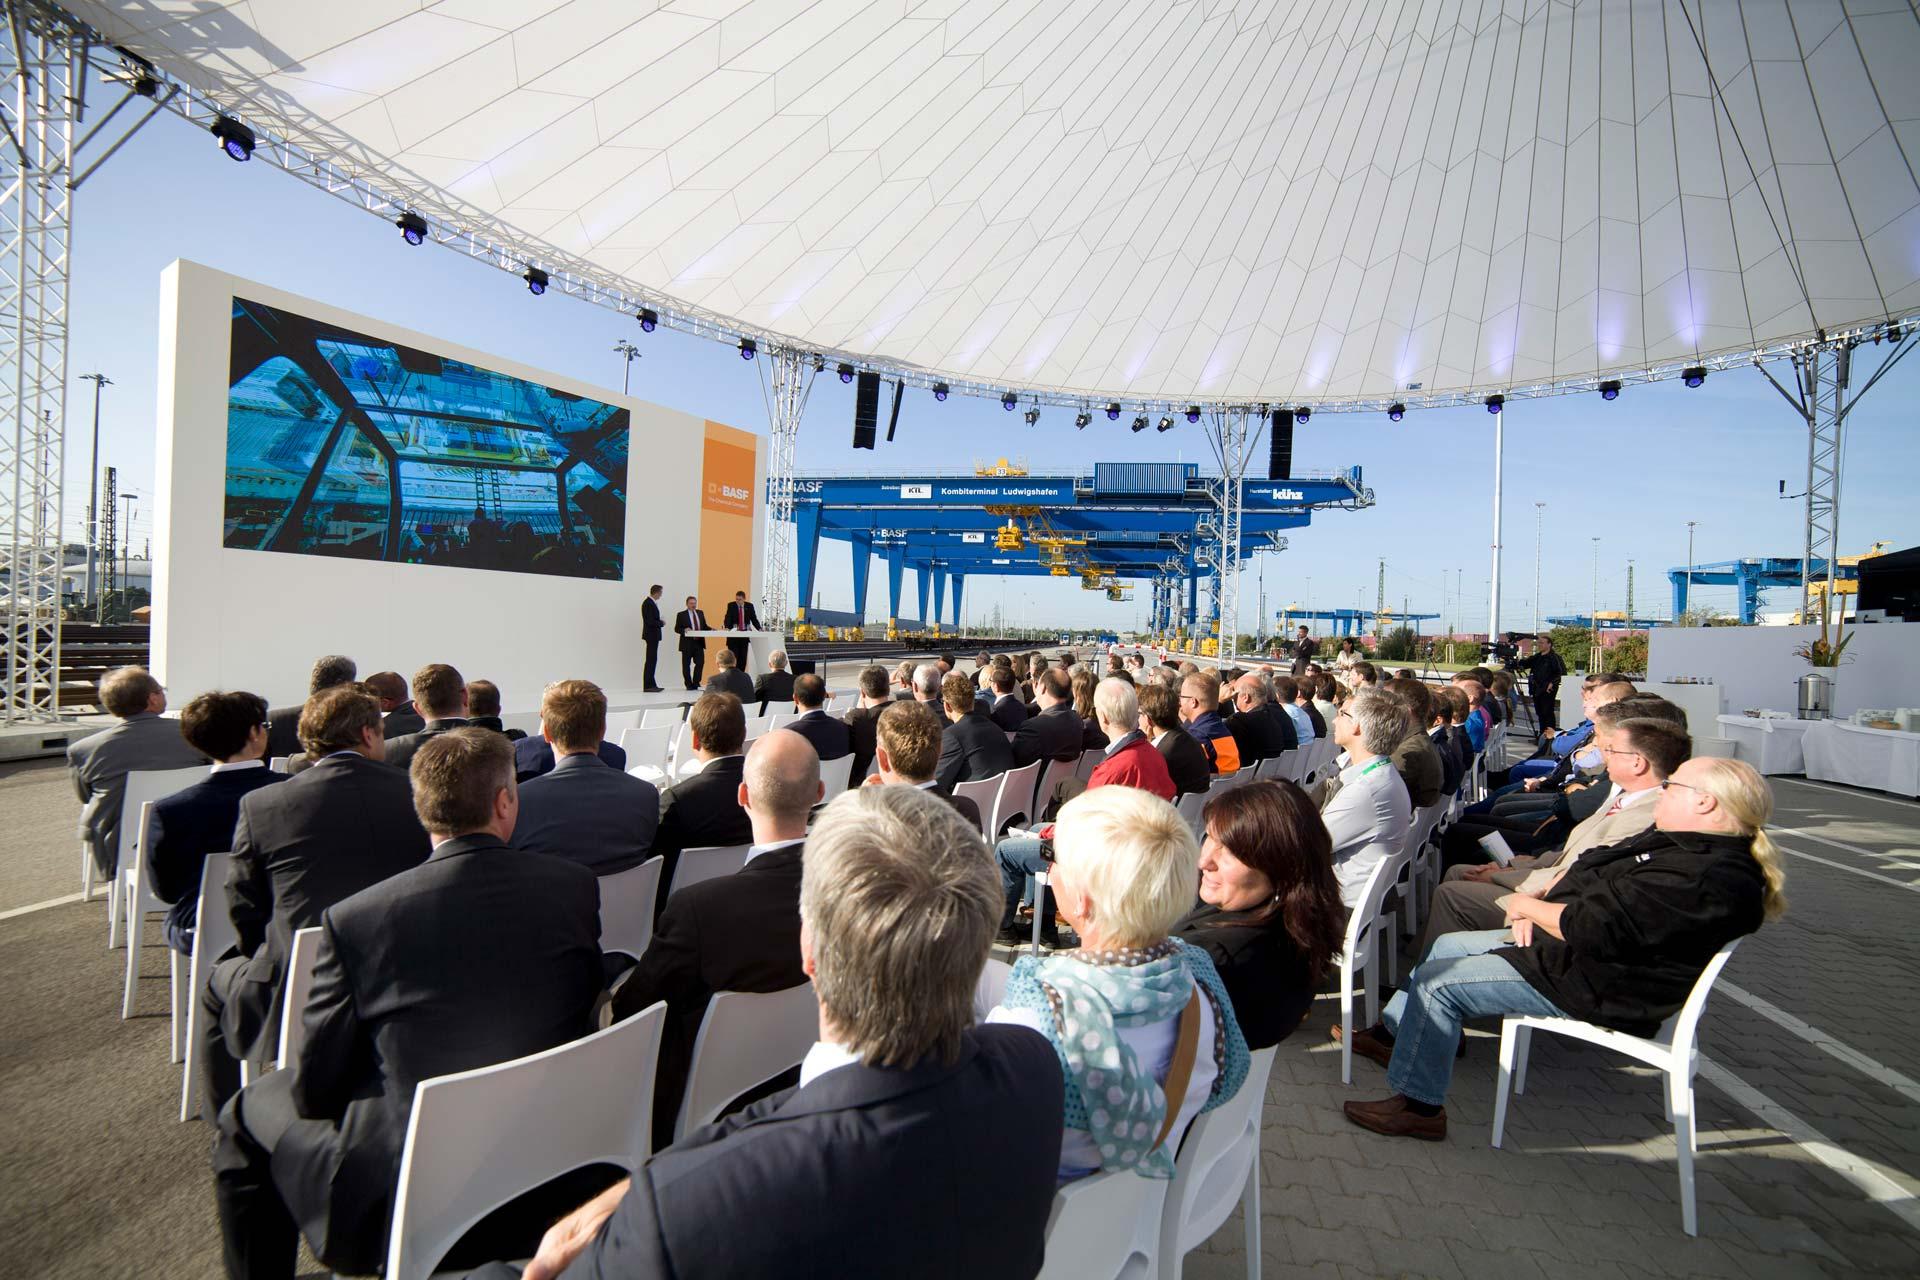 Agentur Ressmann Eröffnungsevent KVT3 Kombiverkehrsterminal